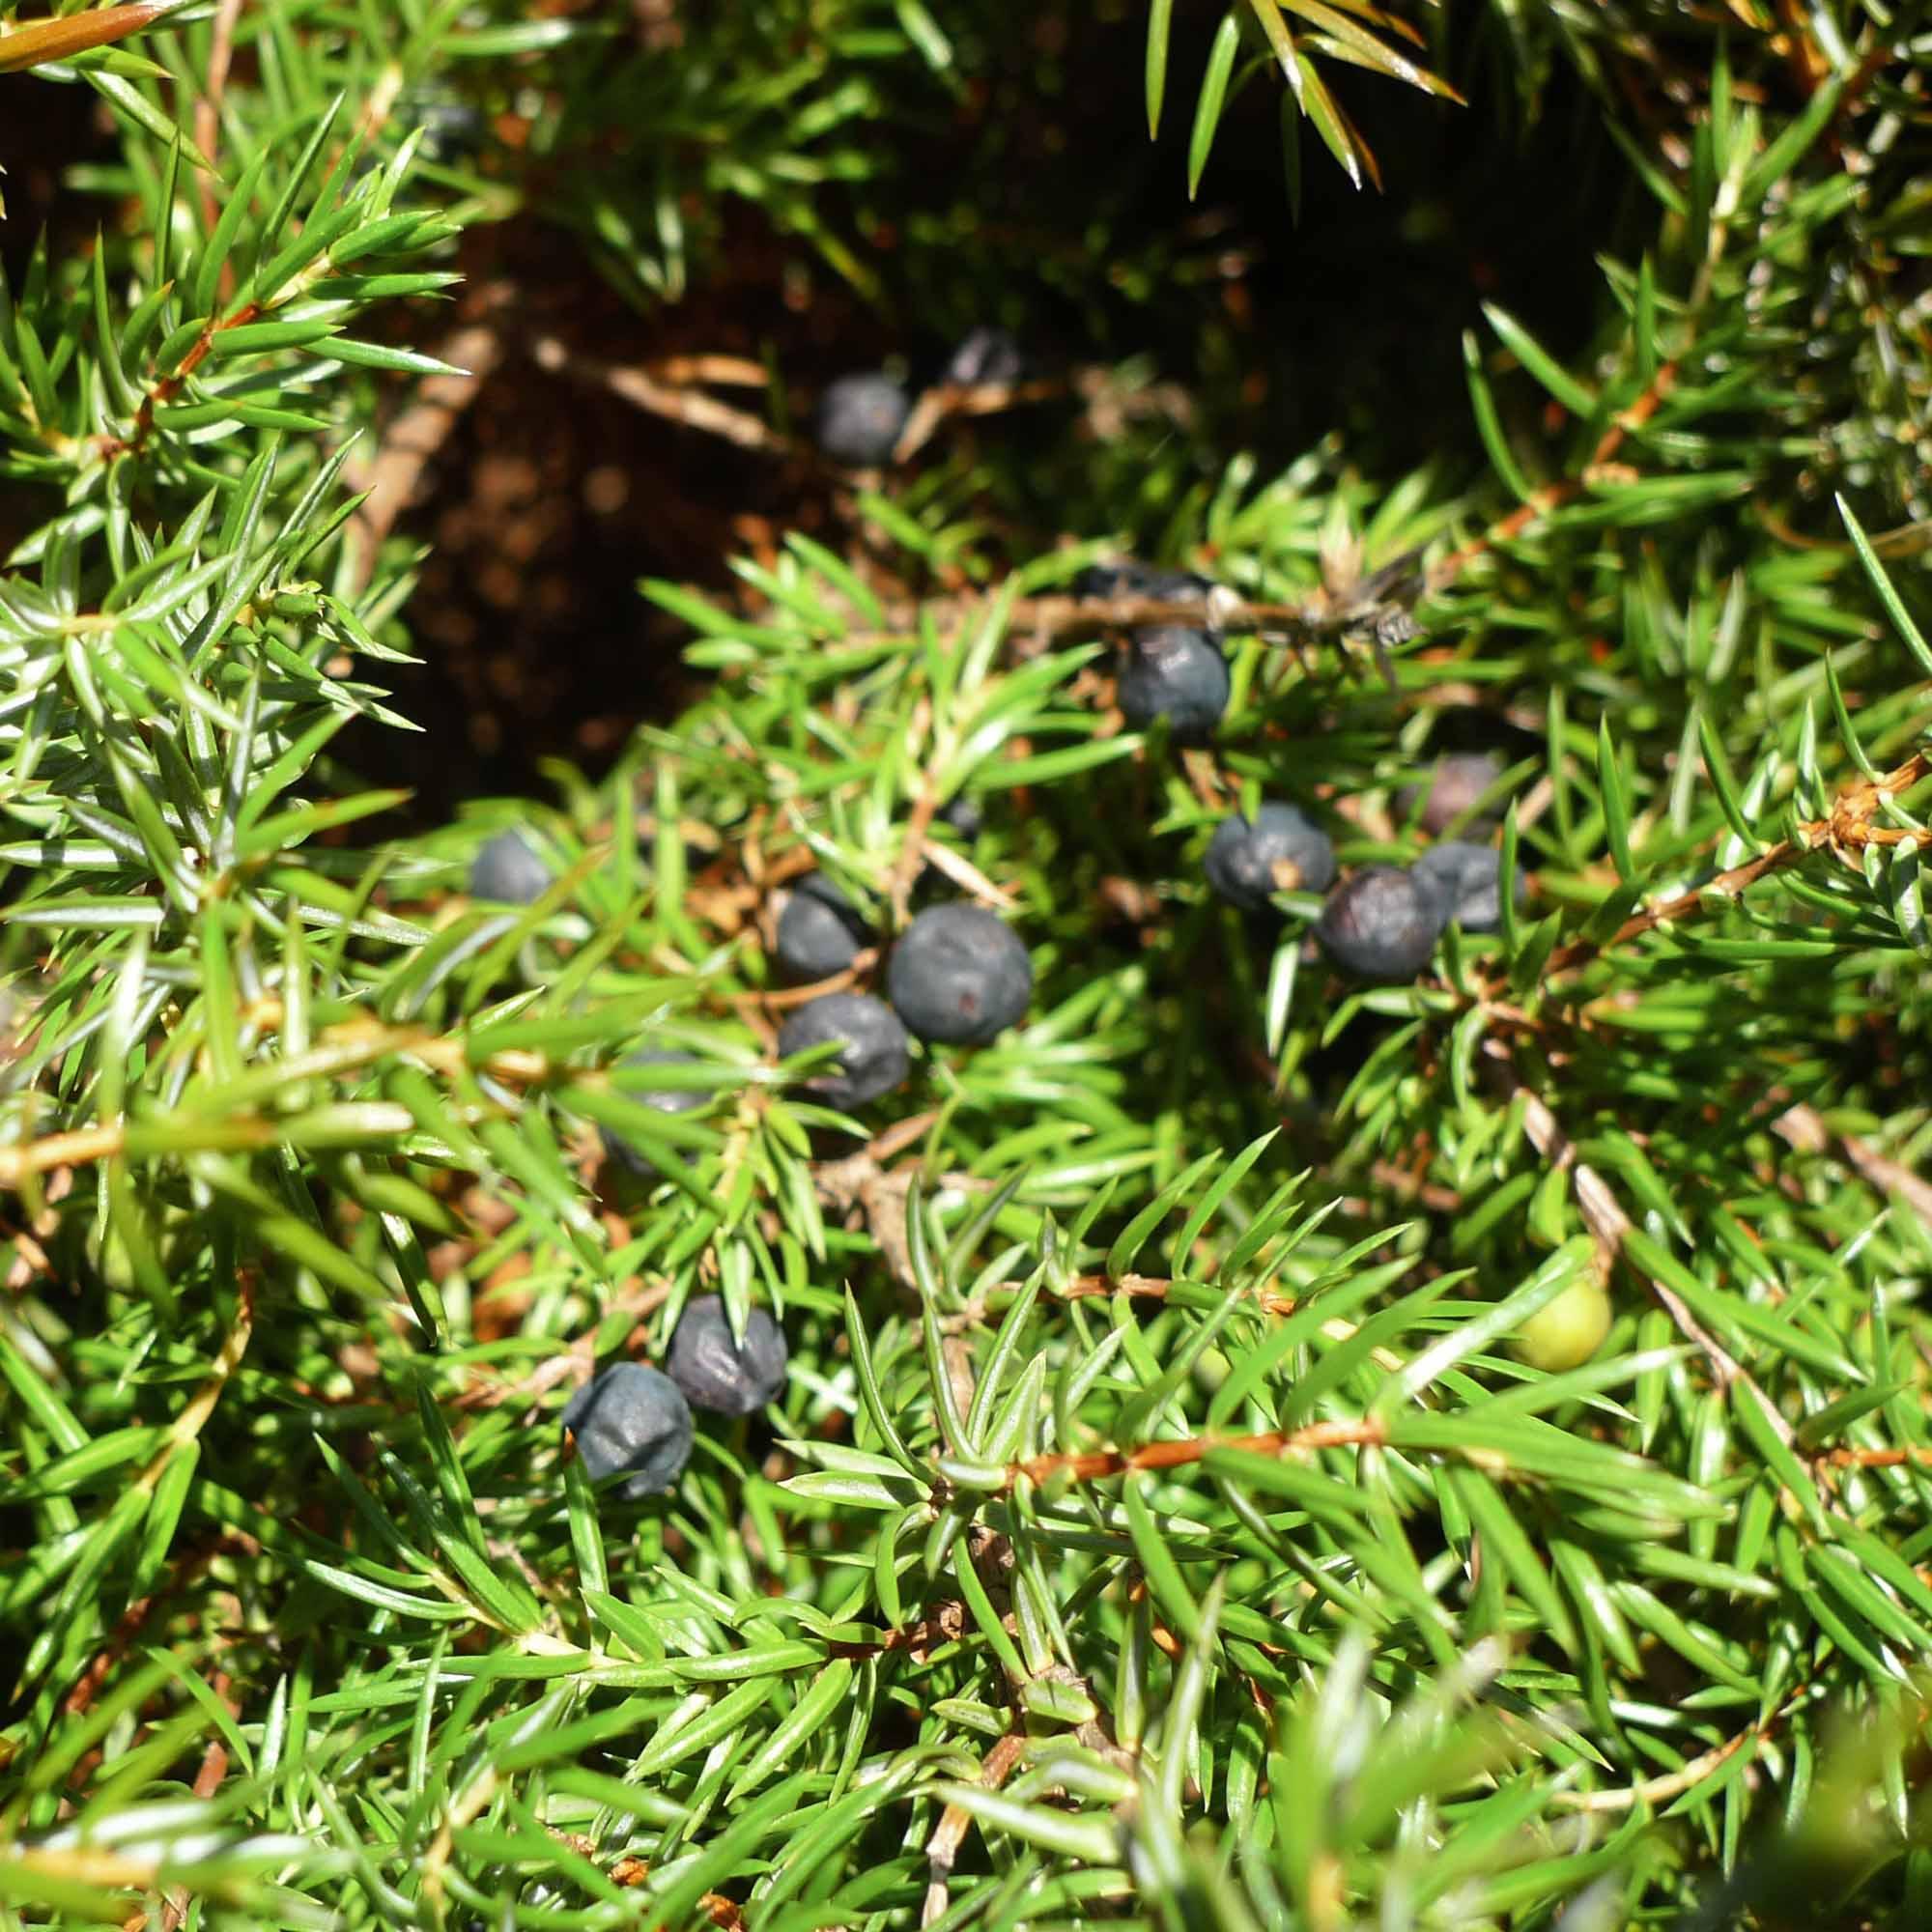 Juniper berries aren't real berries. Photo: Boothby